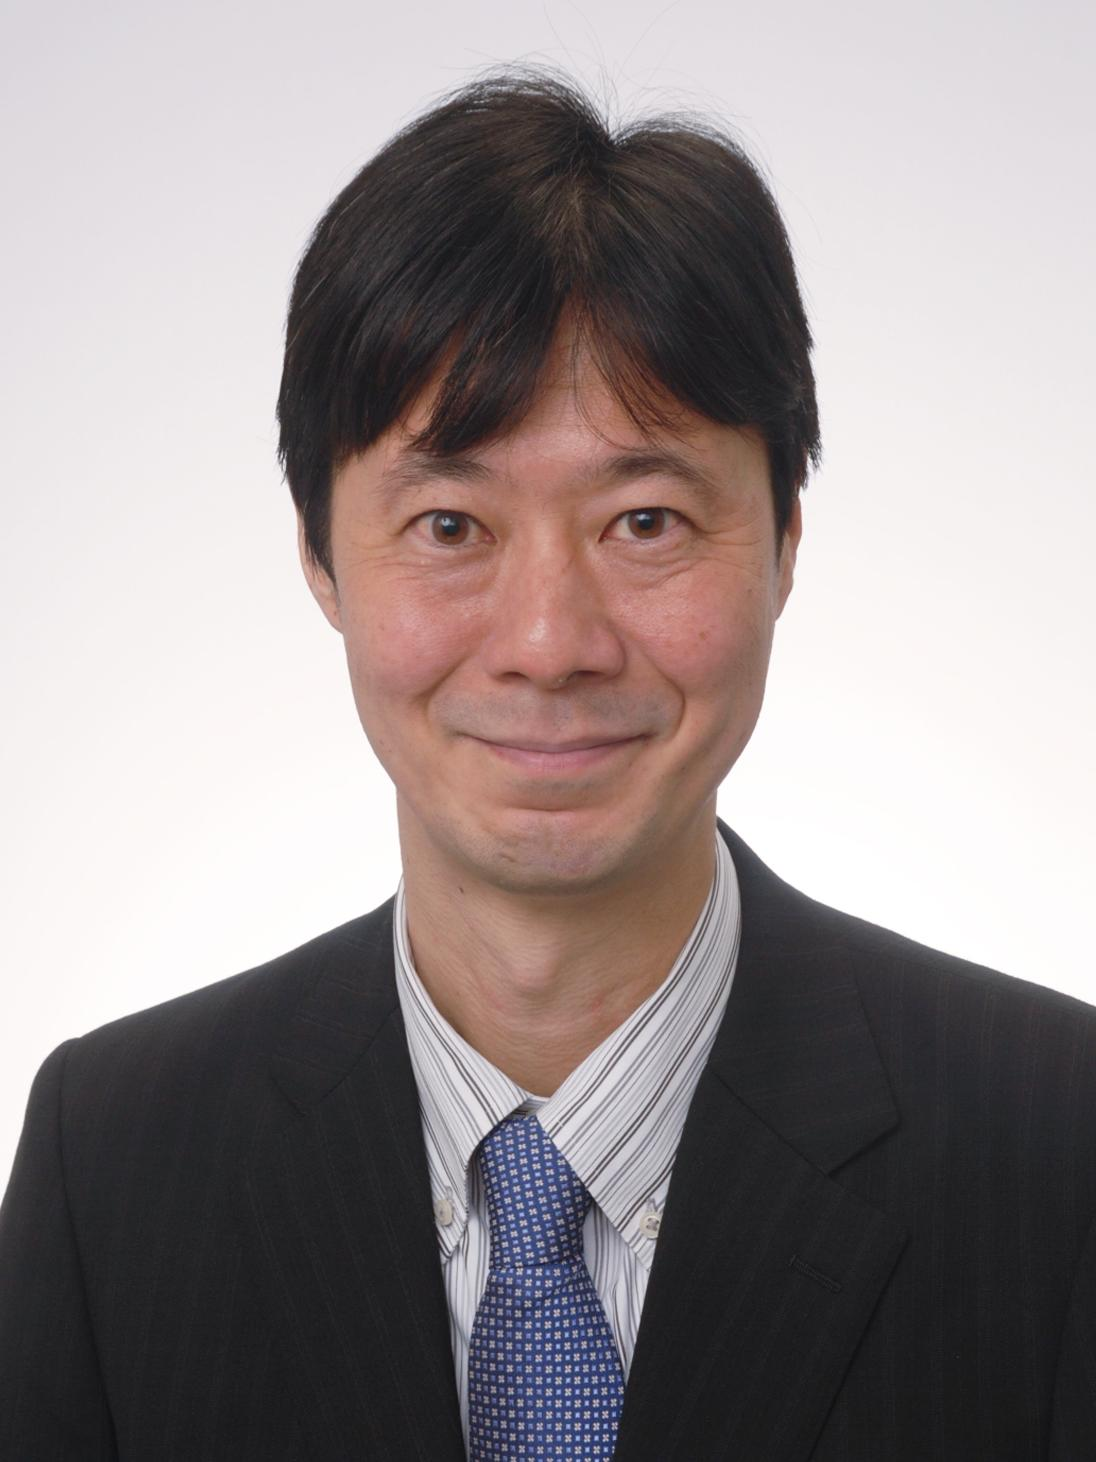 Img42244(中部経済新聞).jpg